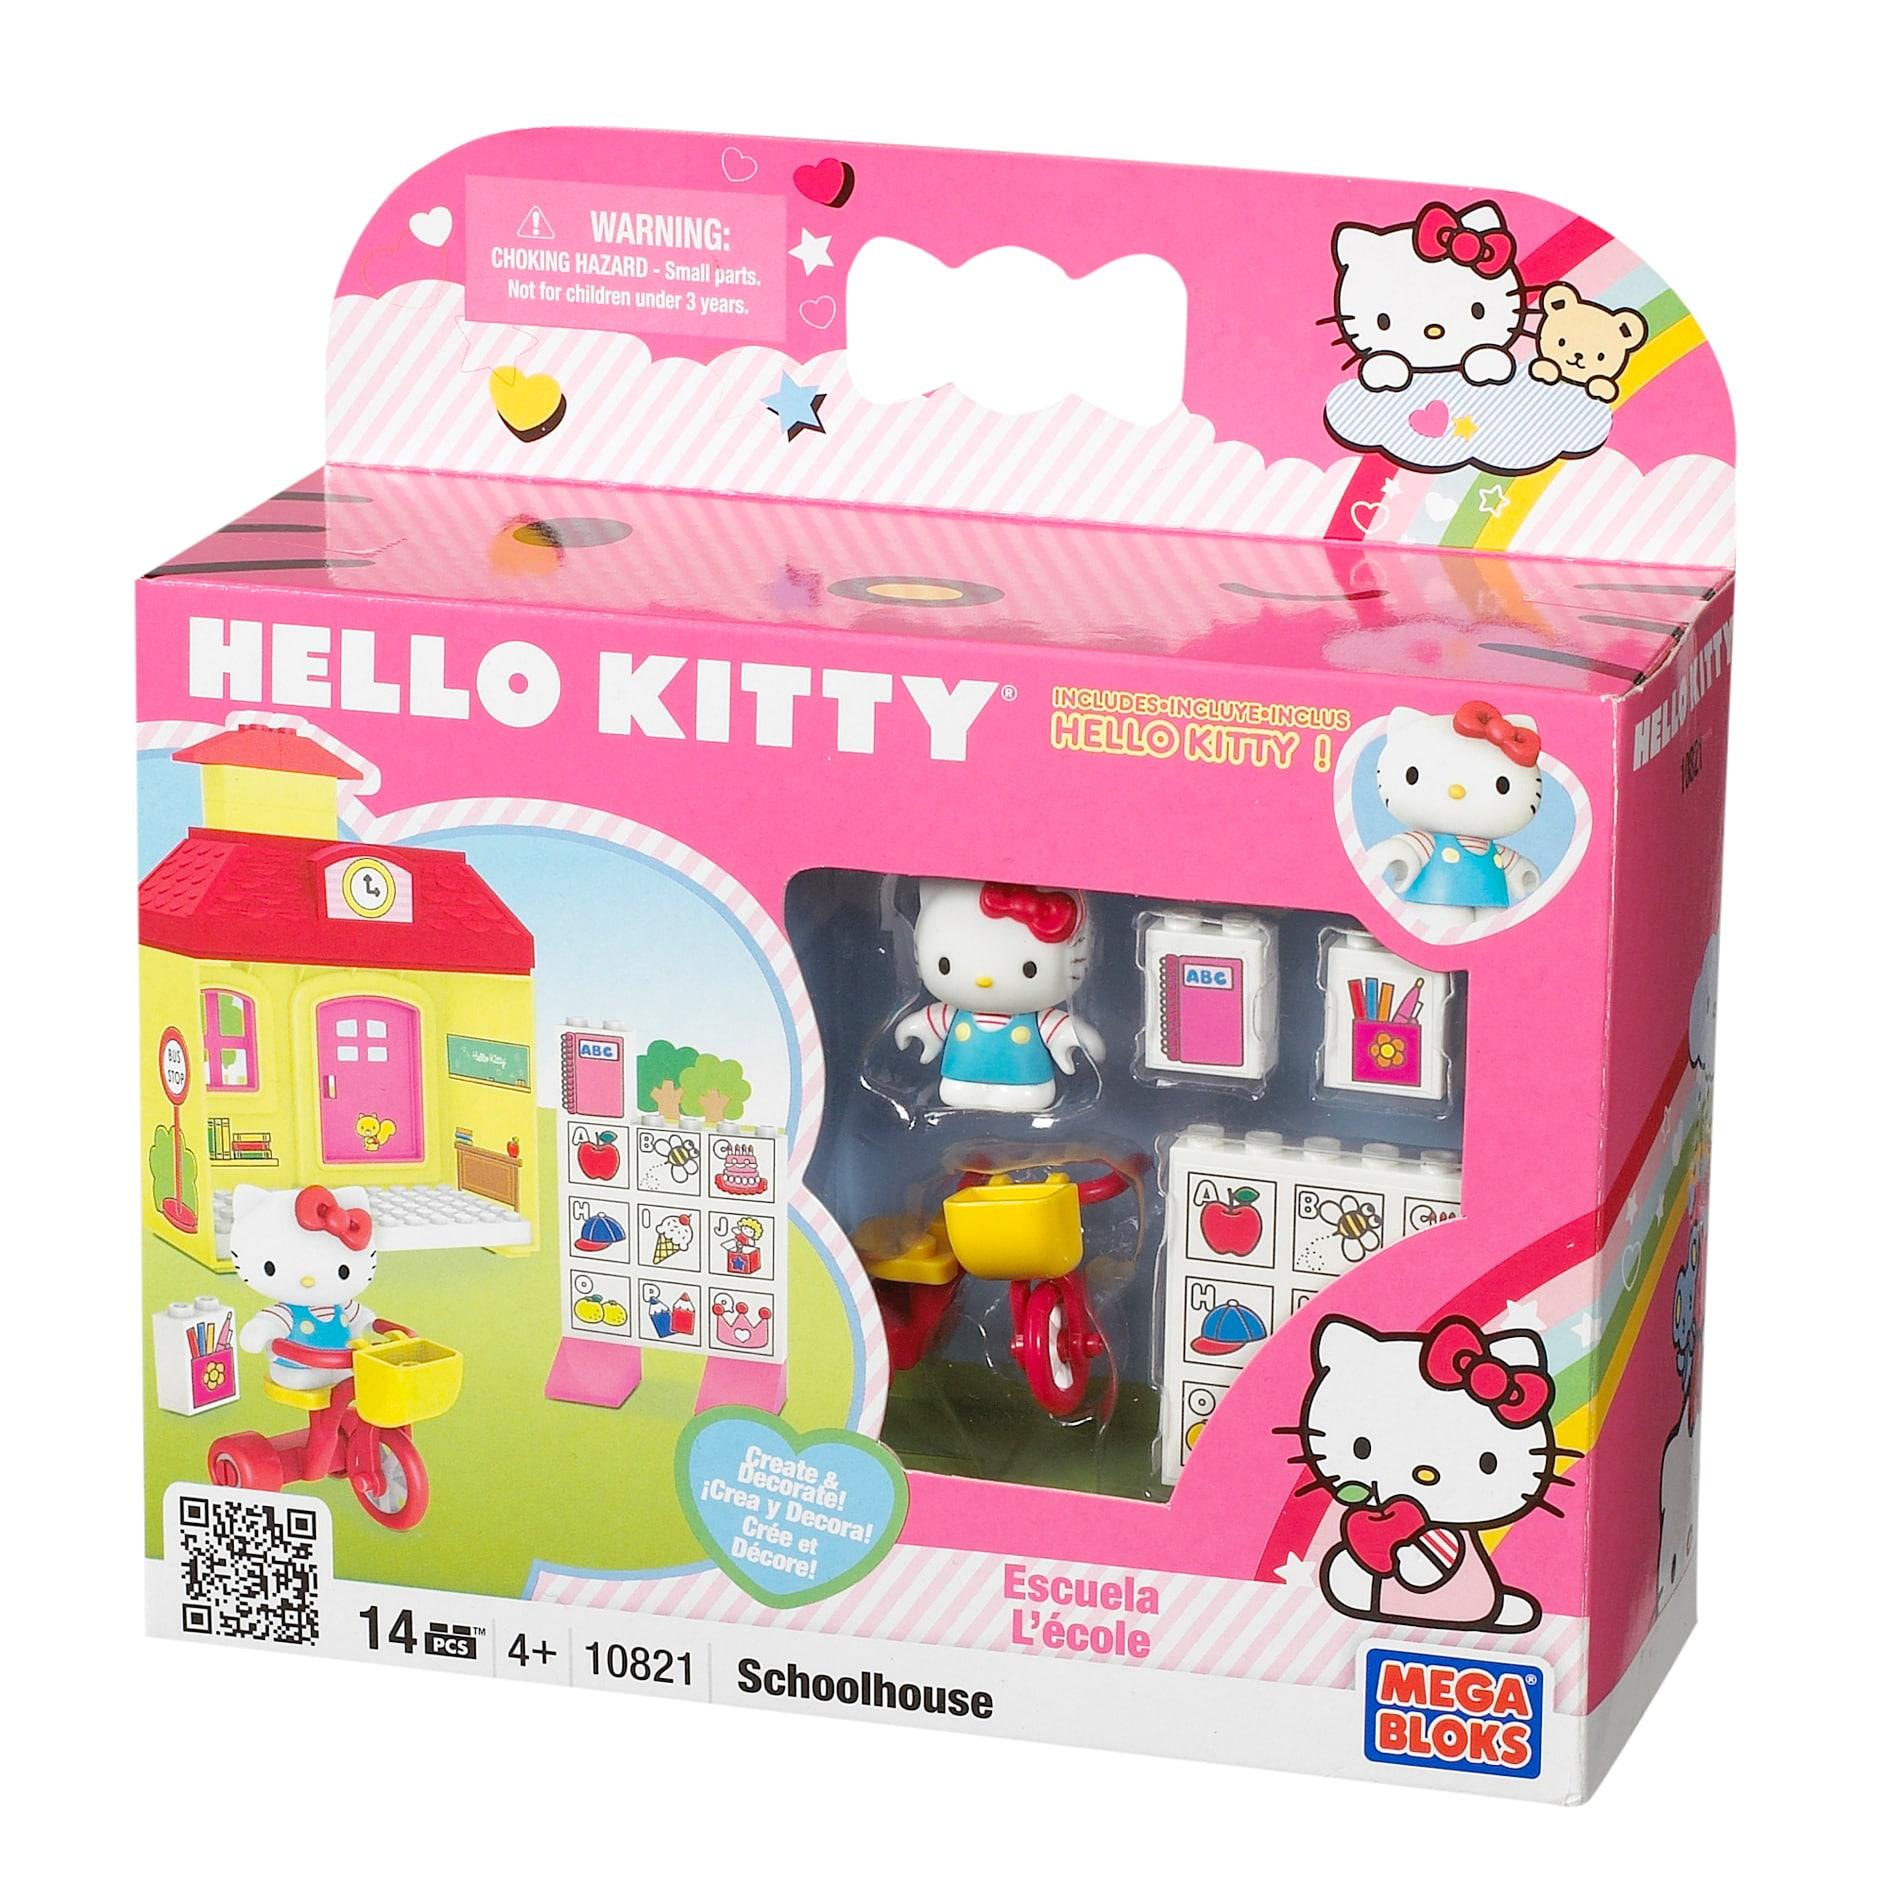 Mega Bloks Hello Kitty School House Play Set